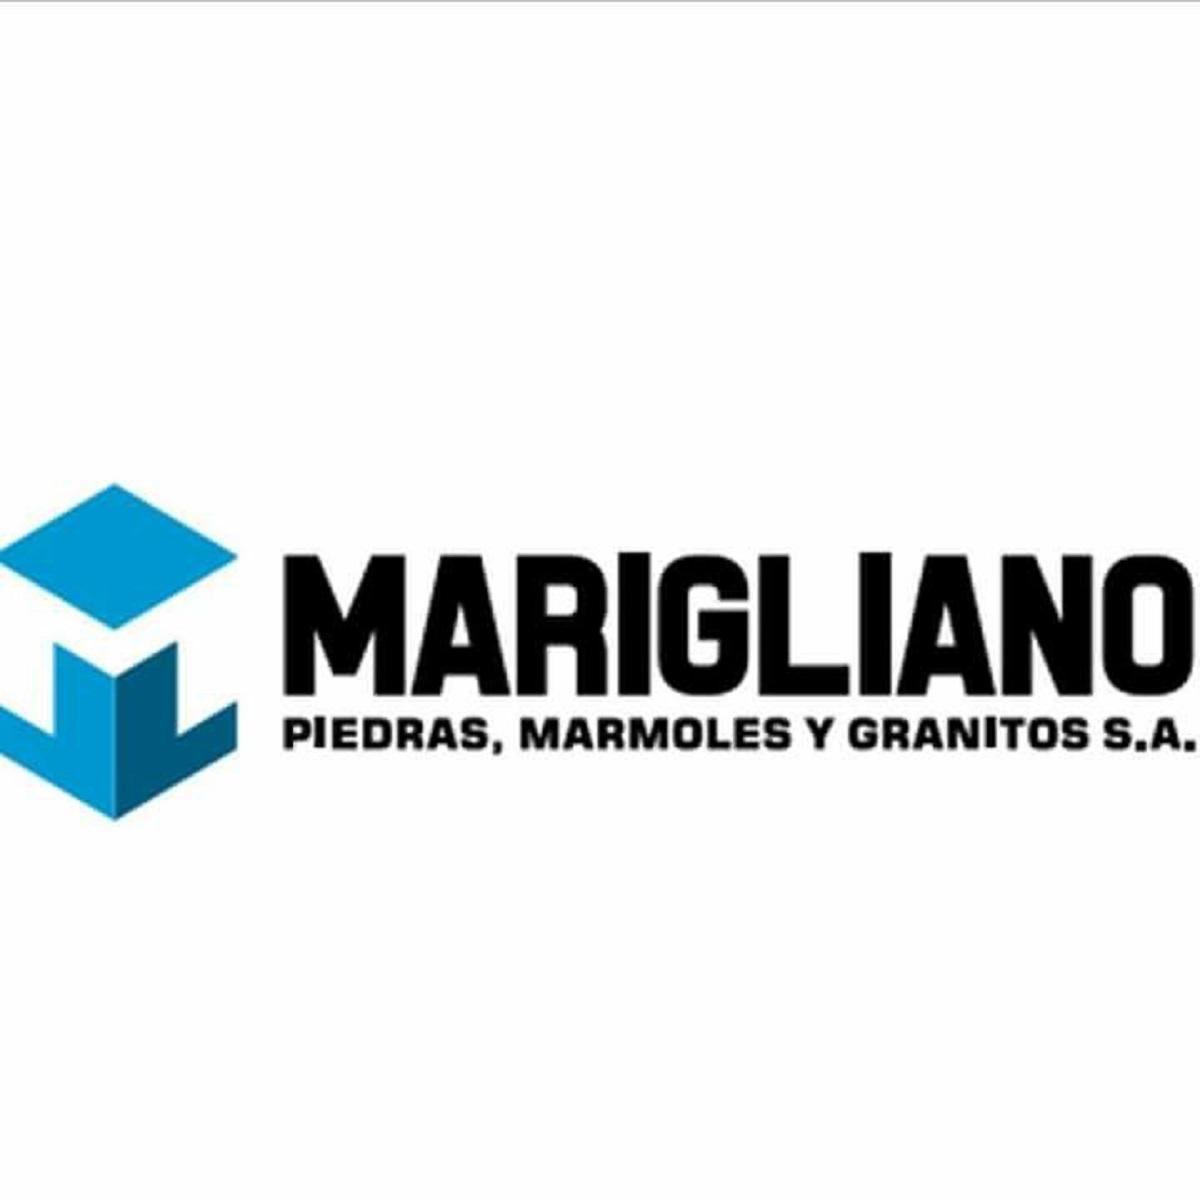 MARIGLIANO MARMOLES